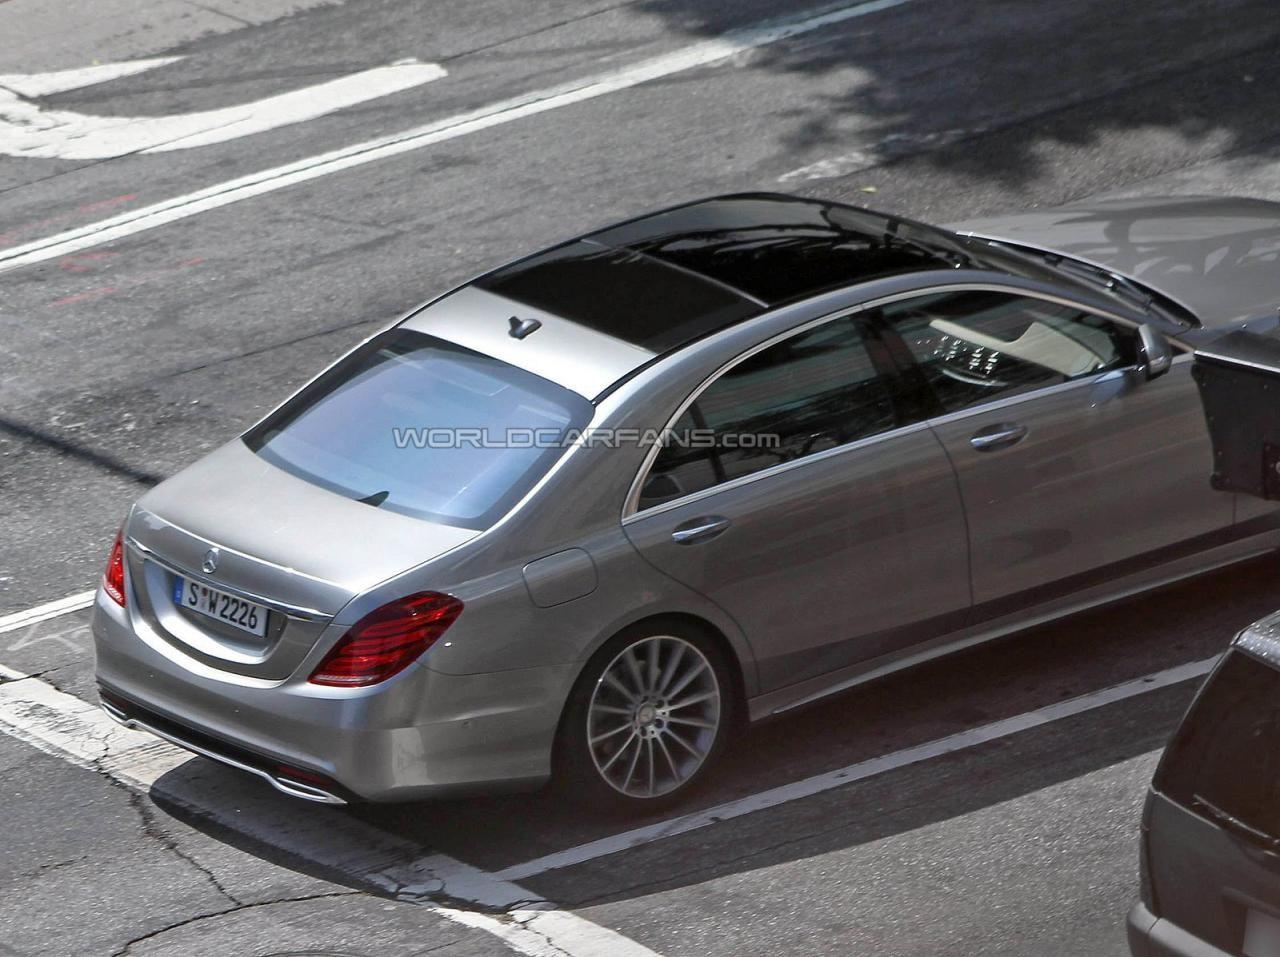 Mercedes s550 white 2014 mercedes benz s550 2014 11885 hd